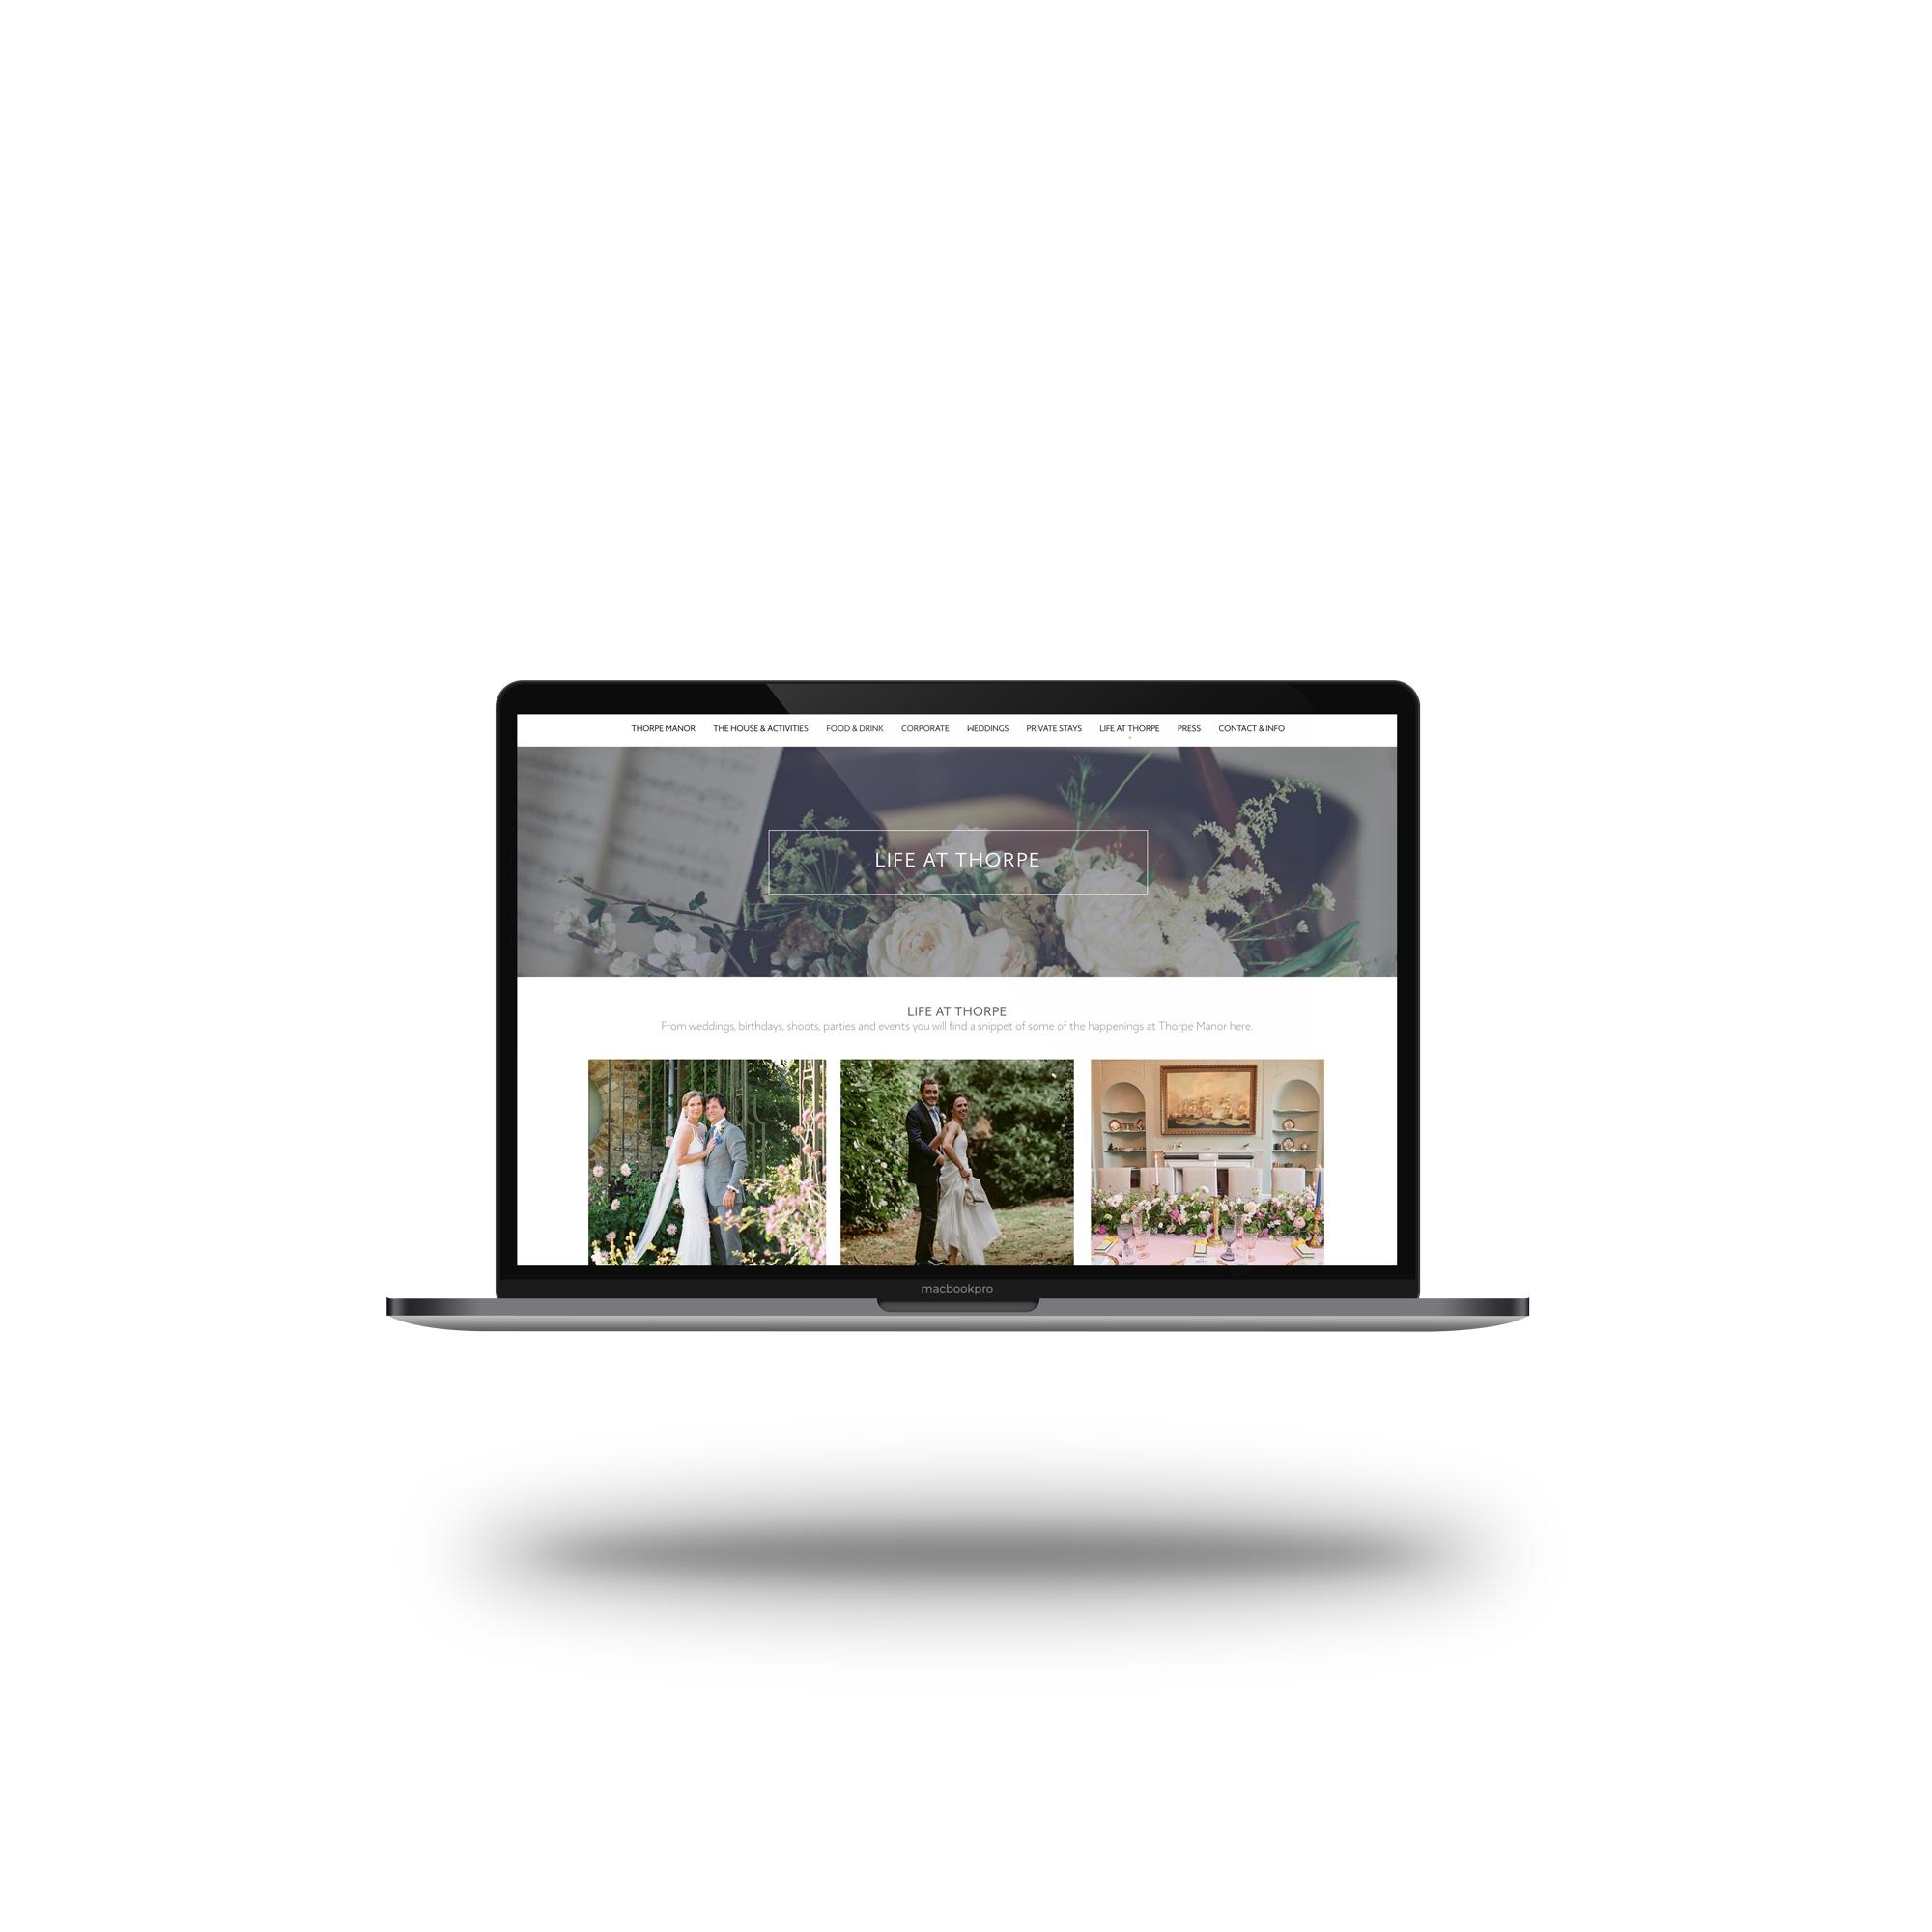 desktopthorpe manor homepage